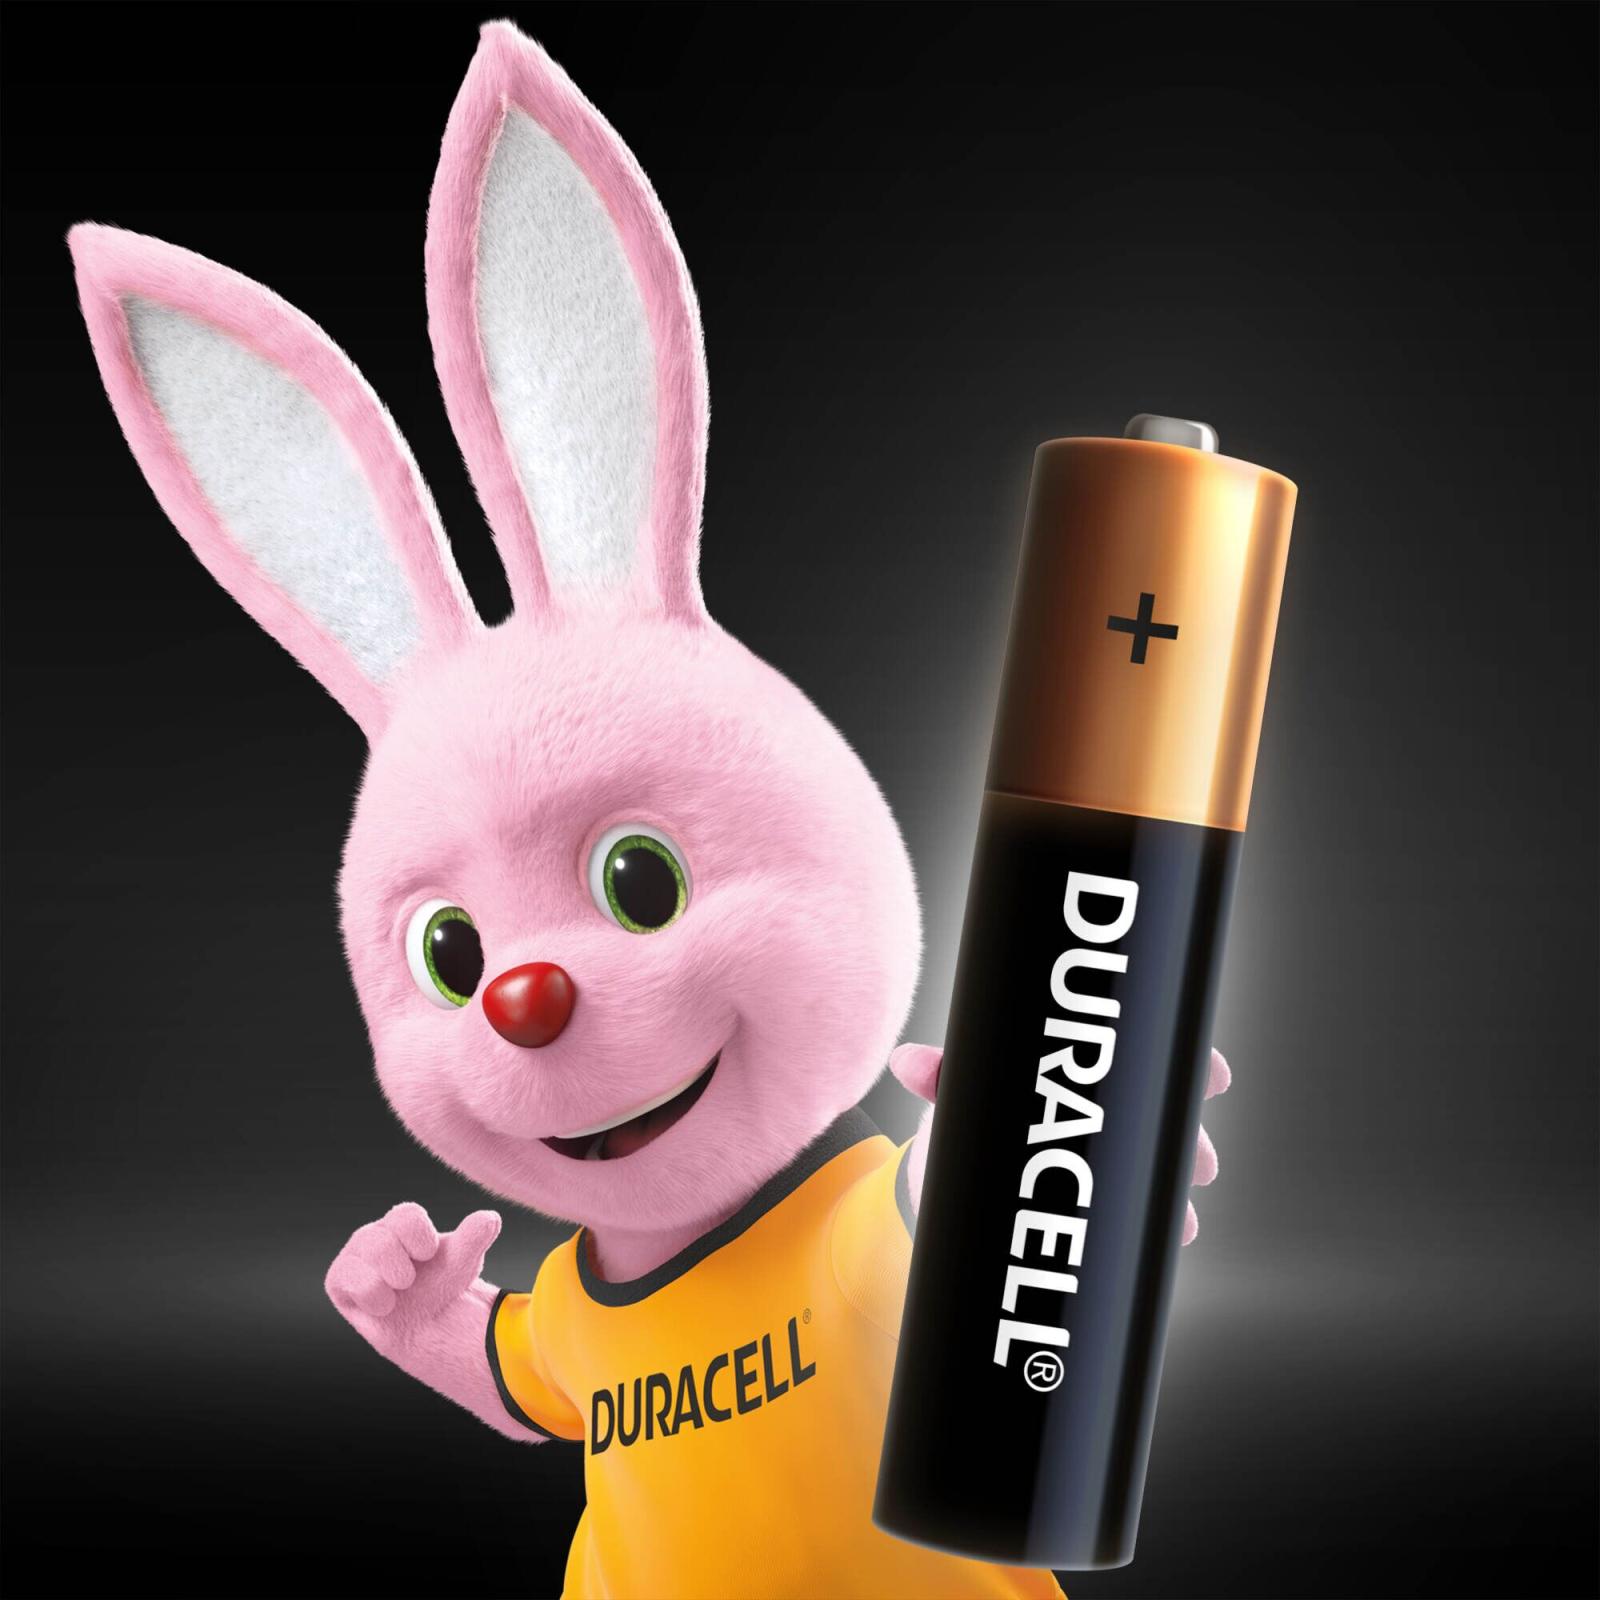 Батарейка Duracell AAA MN2400 LR03 * 8 (5000394203341 / 81480364) изображение 3